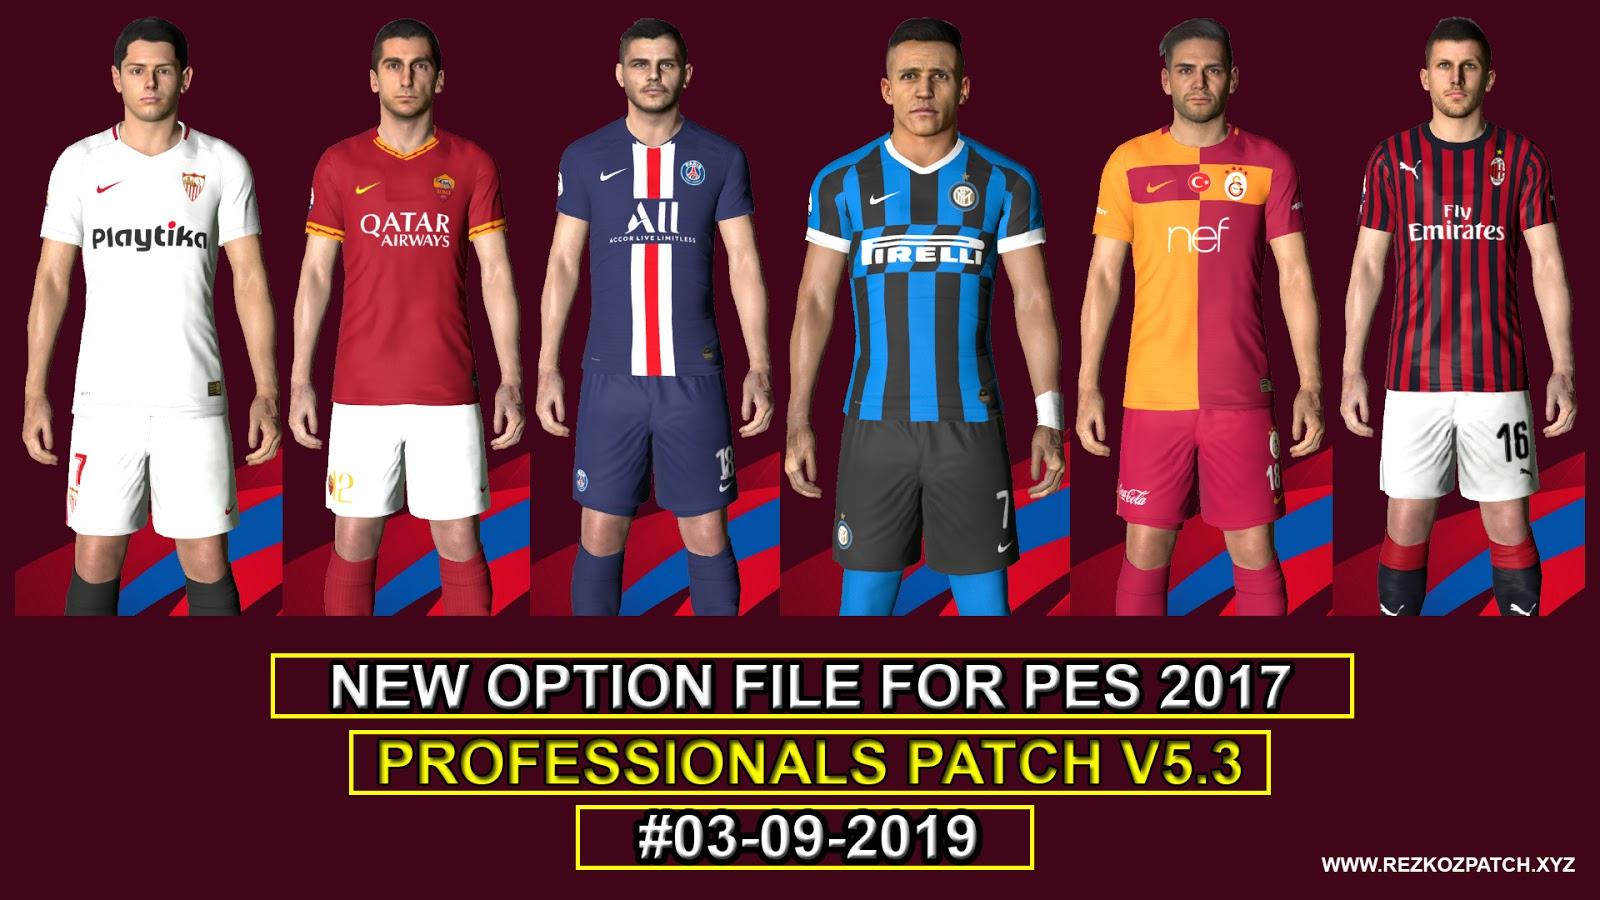 PES 2017 Option File For PES Professionals Patch V5 3 #03-09